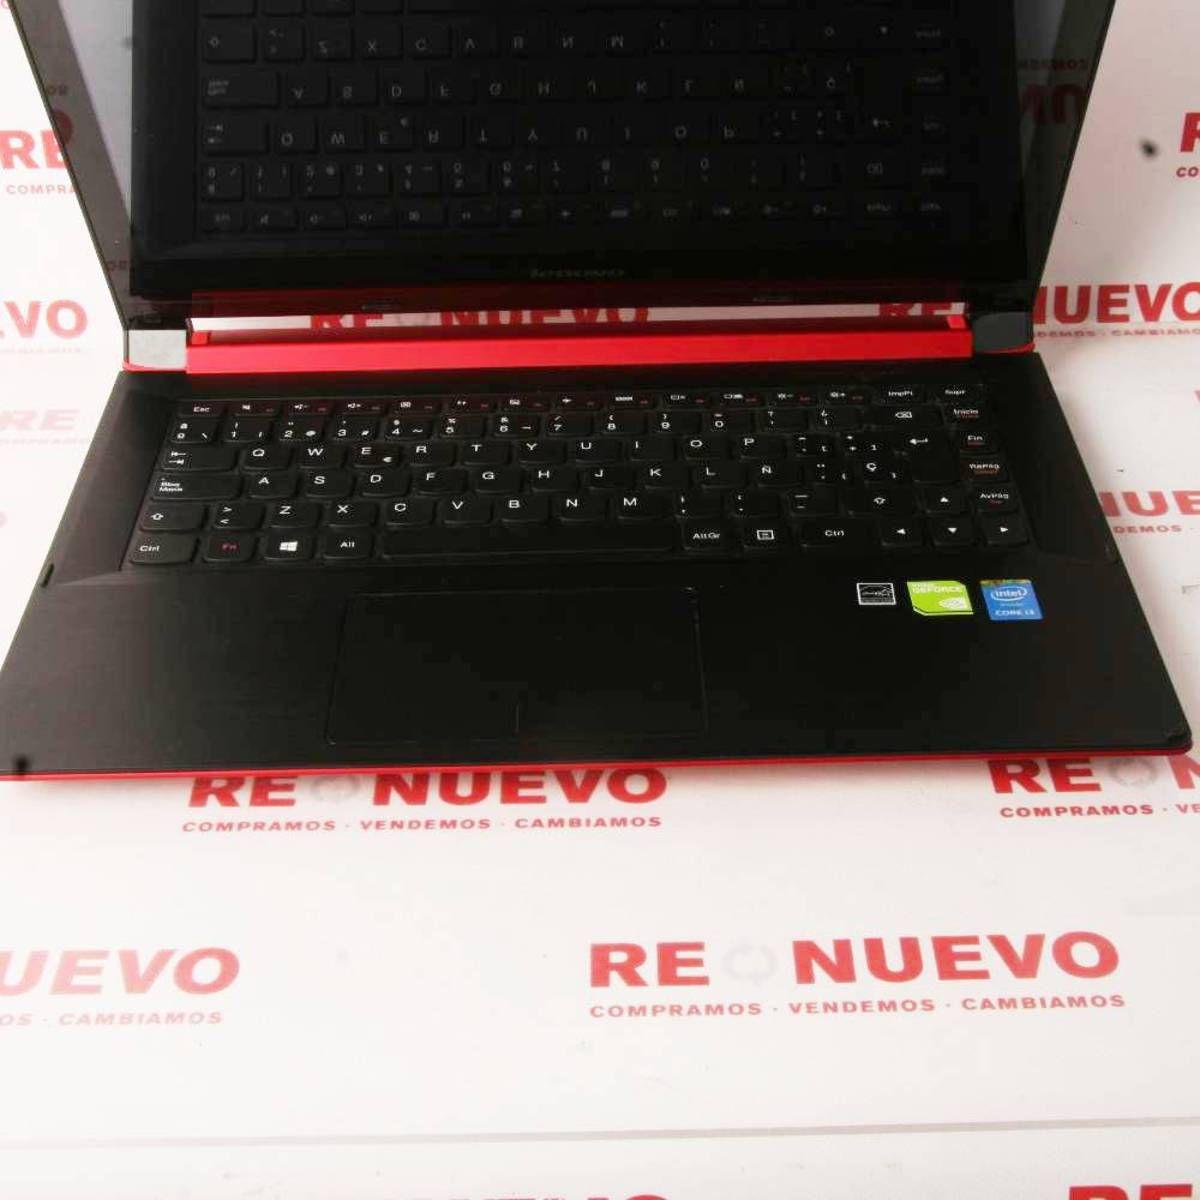 Portatil Lenovo Flex 2 14 De Segunda Mano E279629 Tienda Online